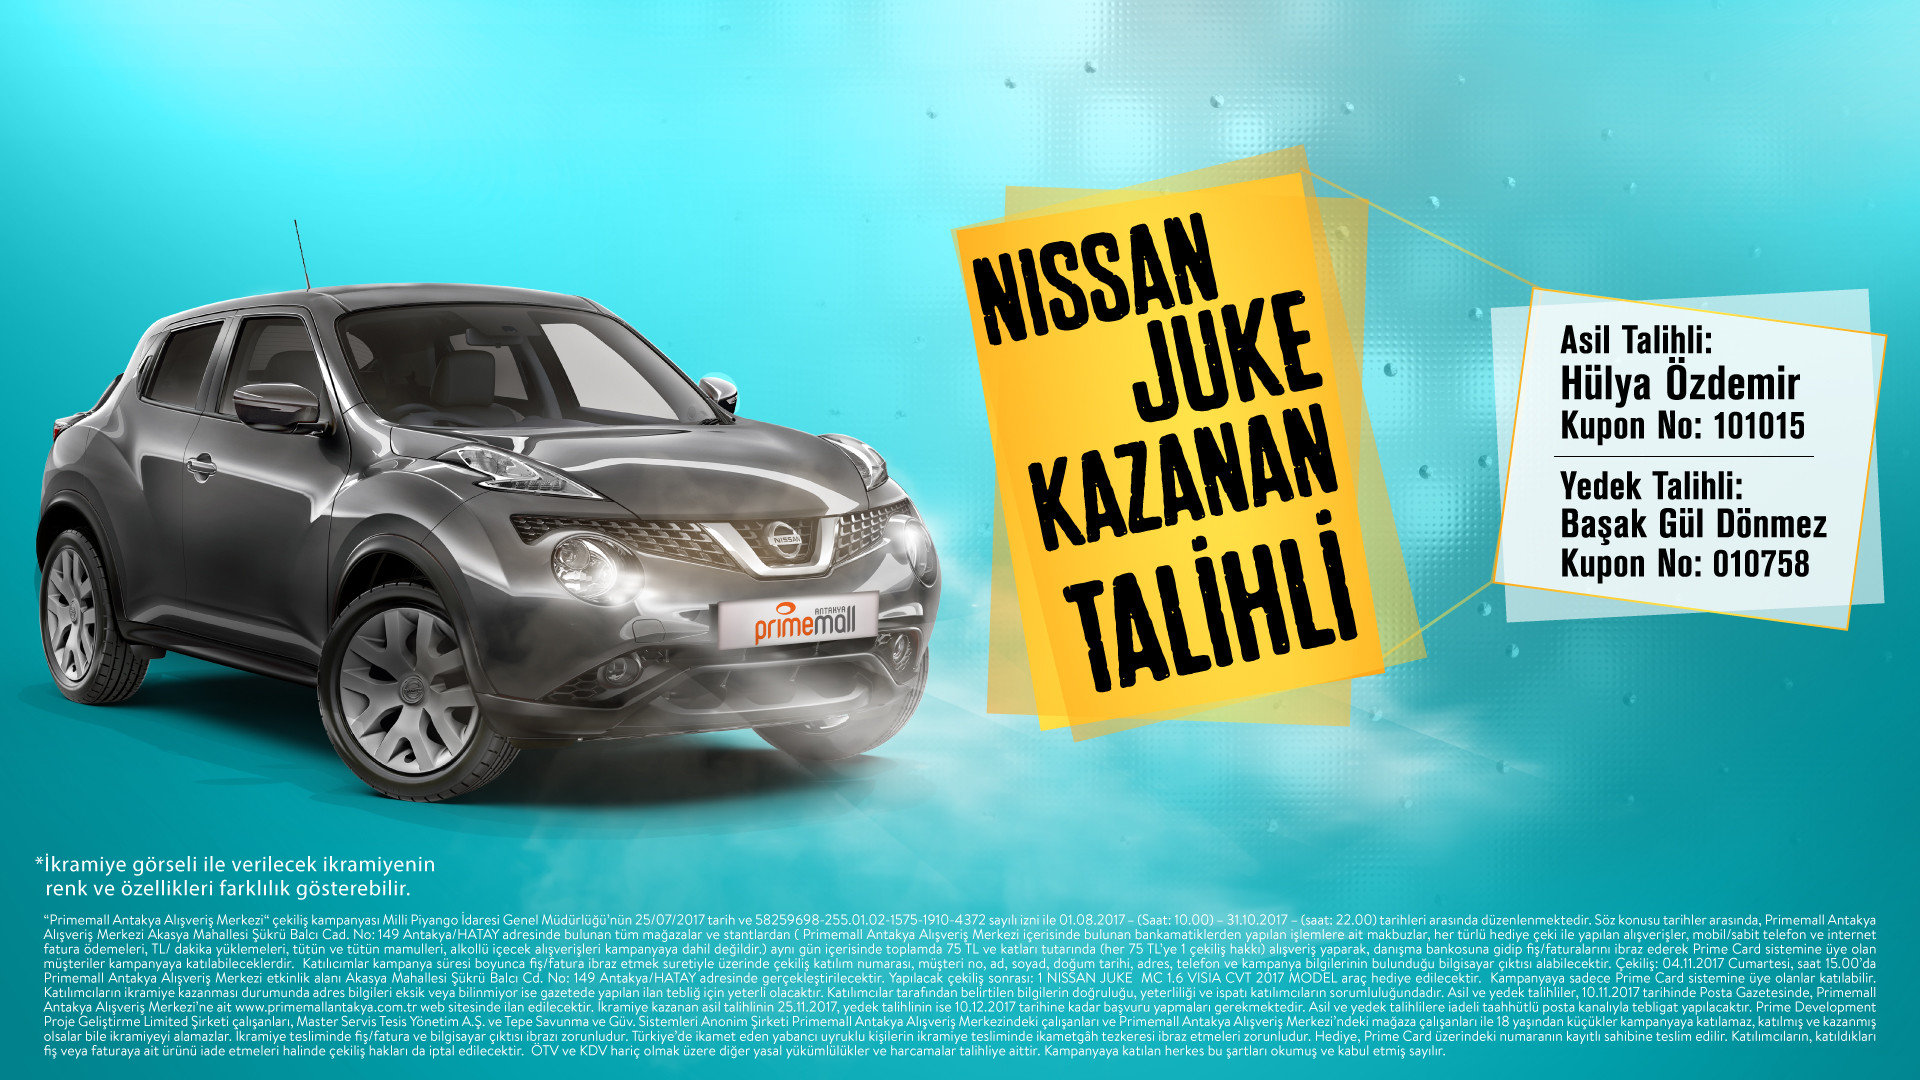 Nissan Juke Kazanan Talihli